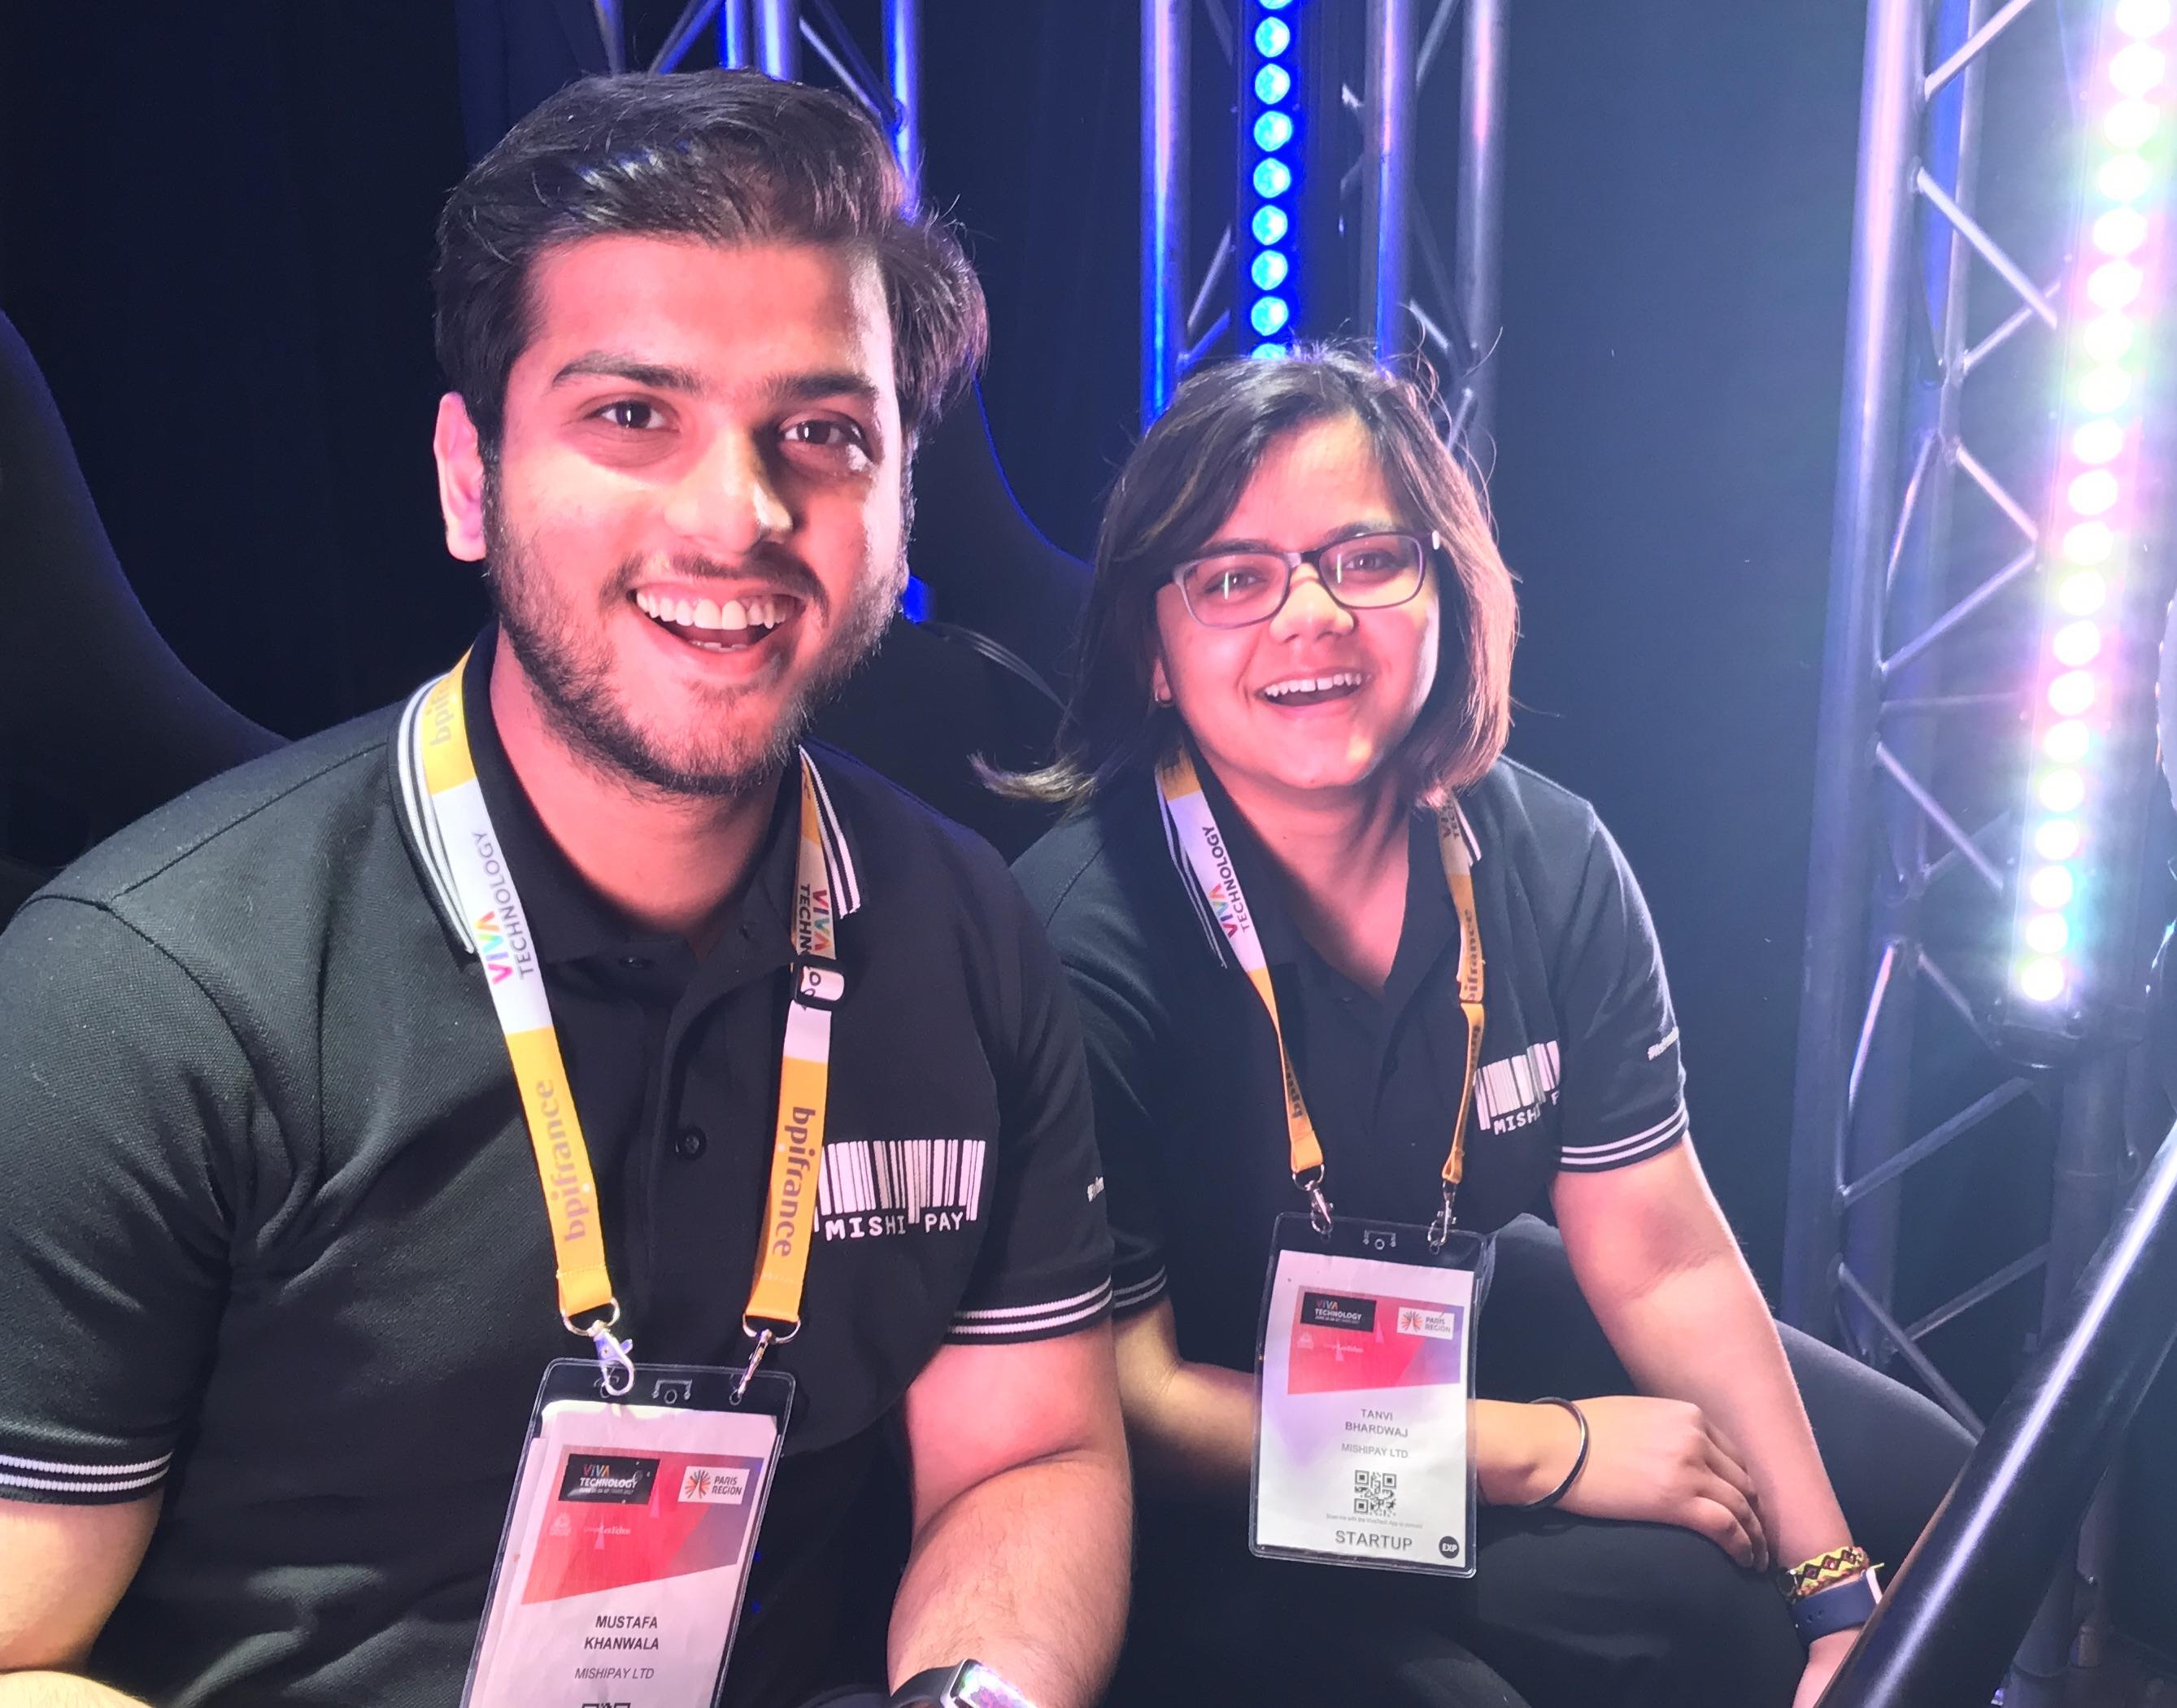 MishiPay raises £1 6M led by Nauta Capital for its mobile